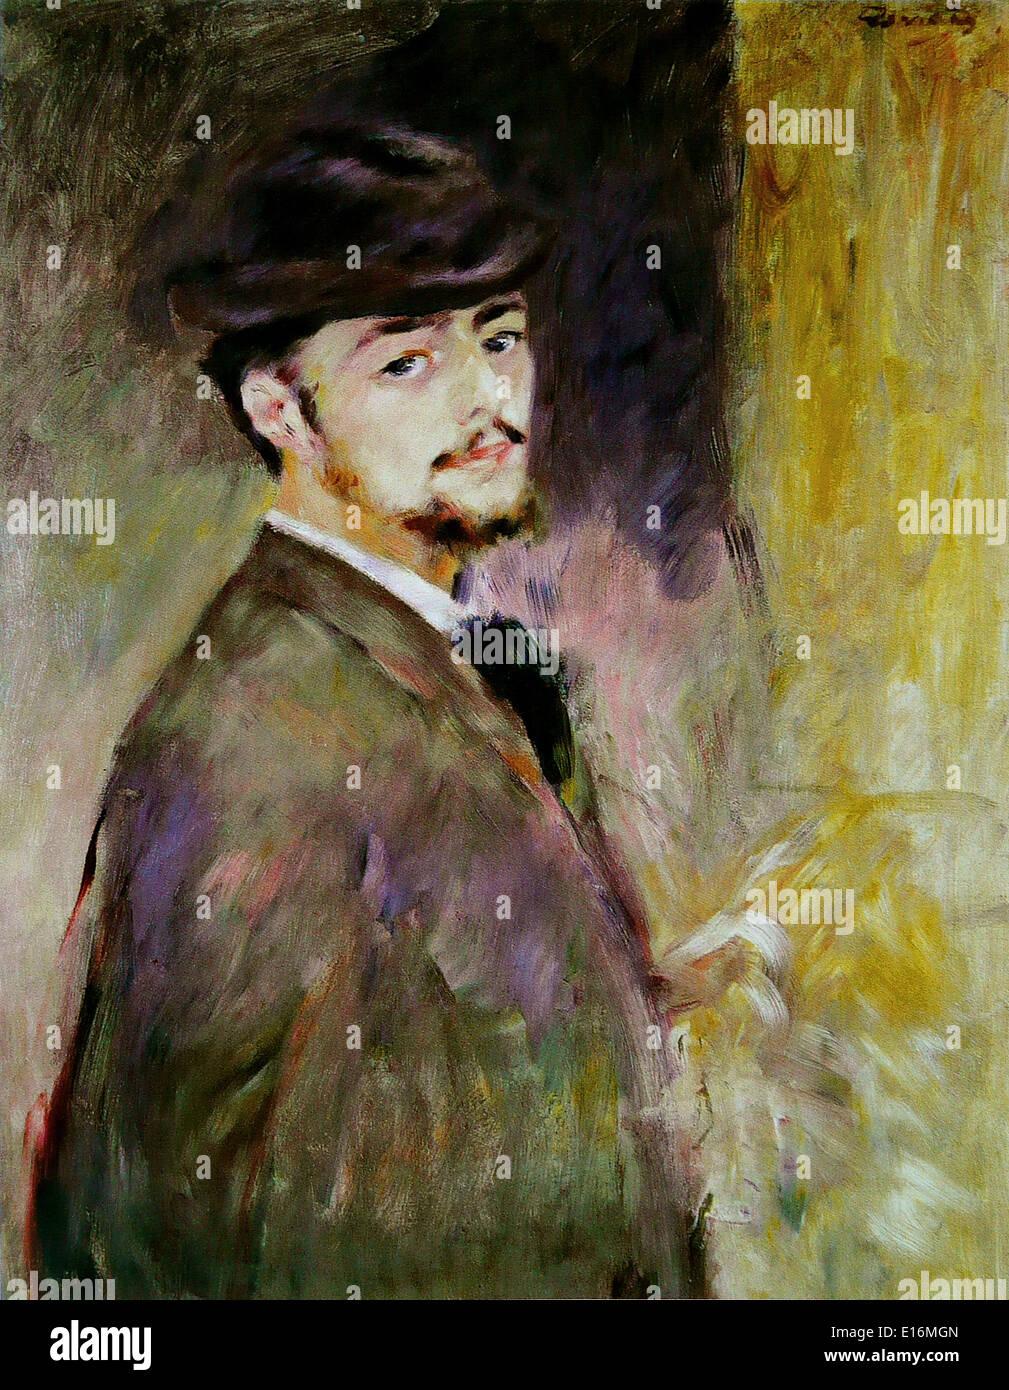 Self-Portrait by Pierre-Auguste Renoir, 1876 - Stock Image